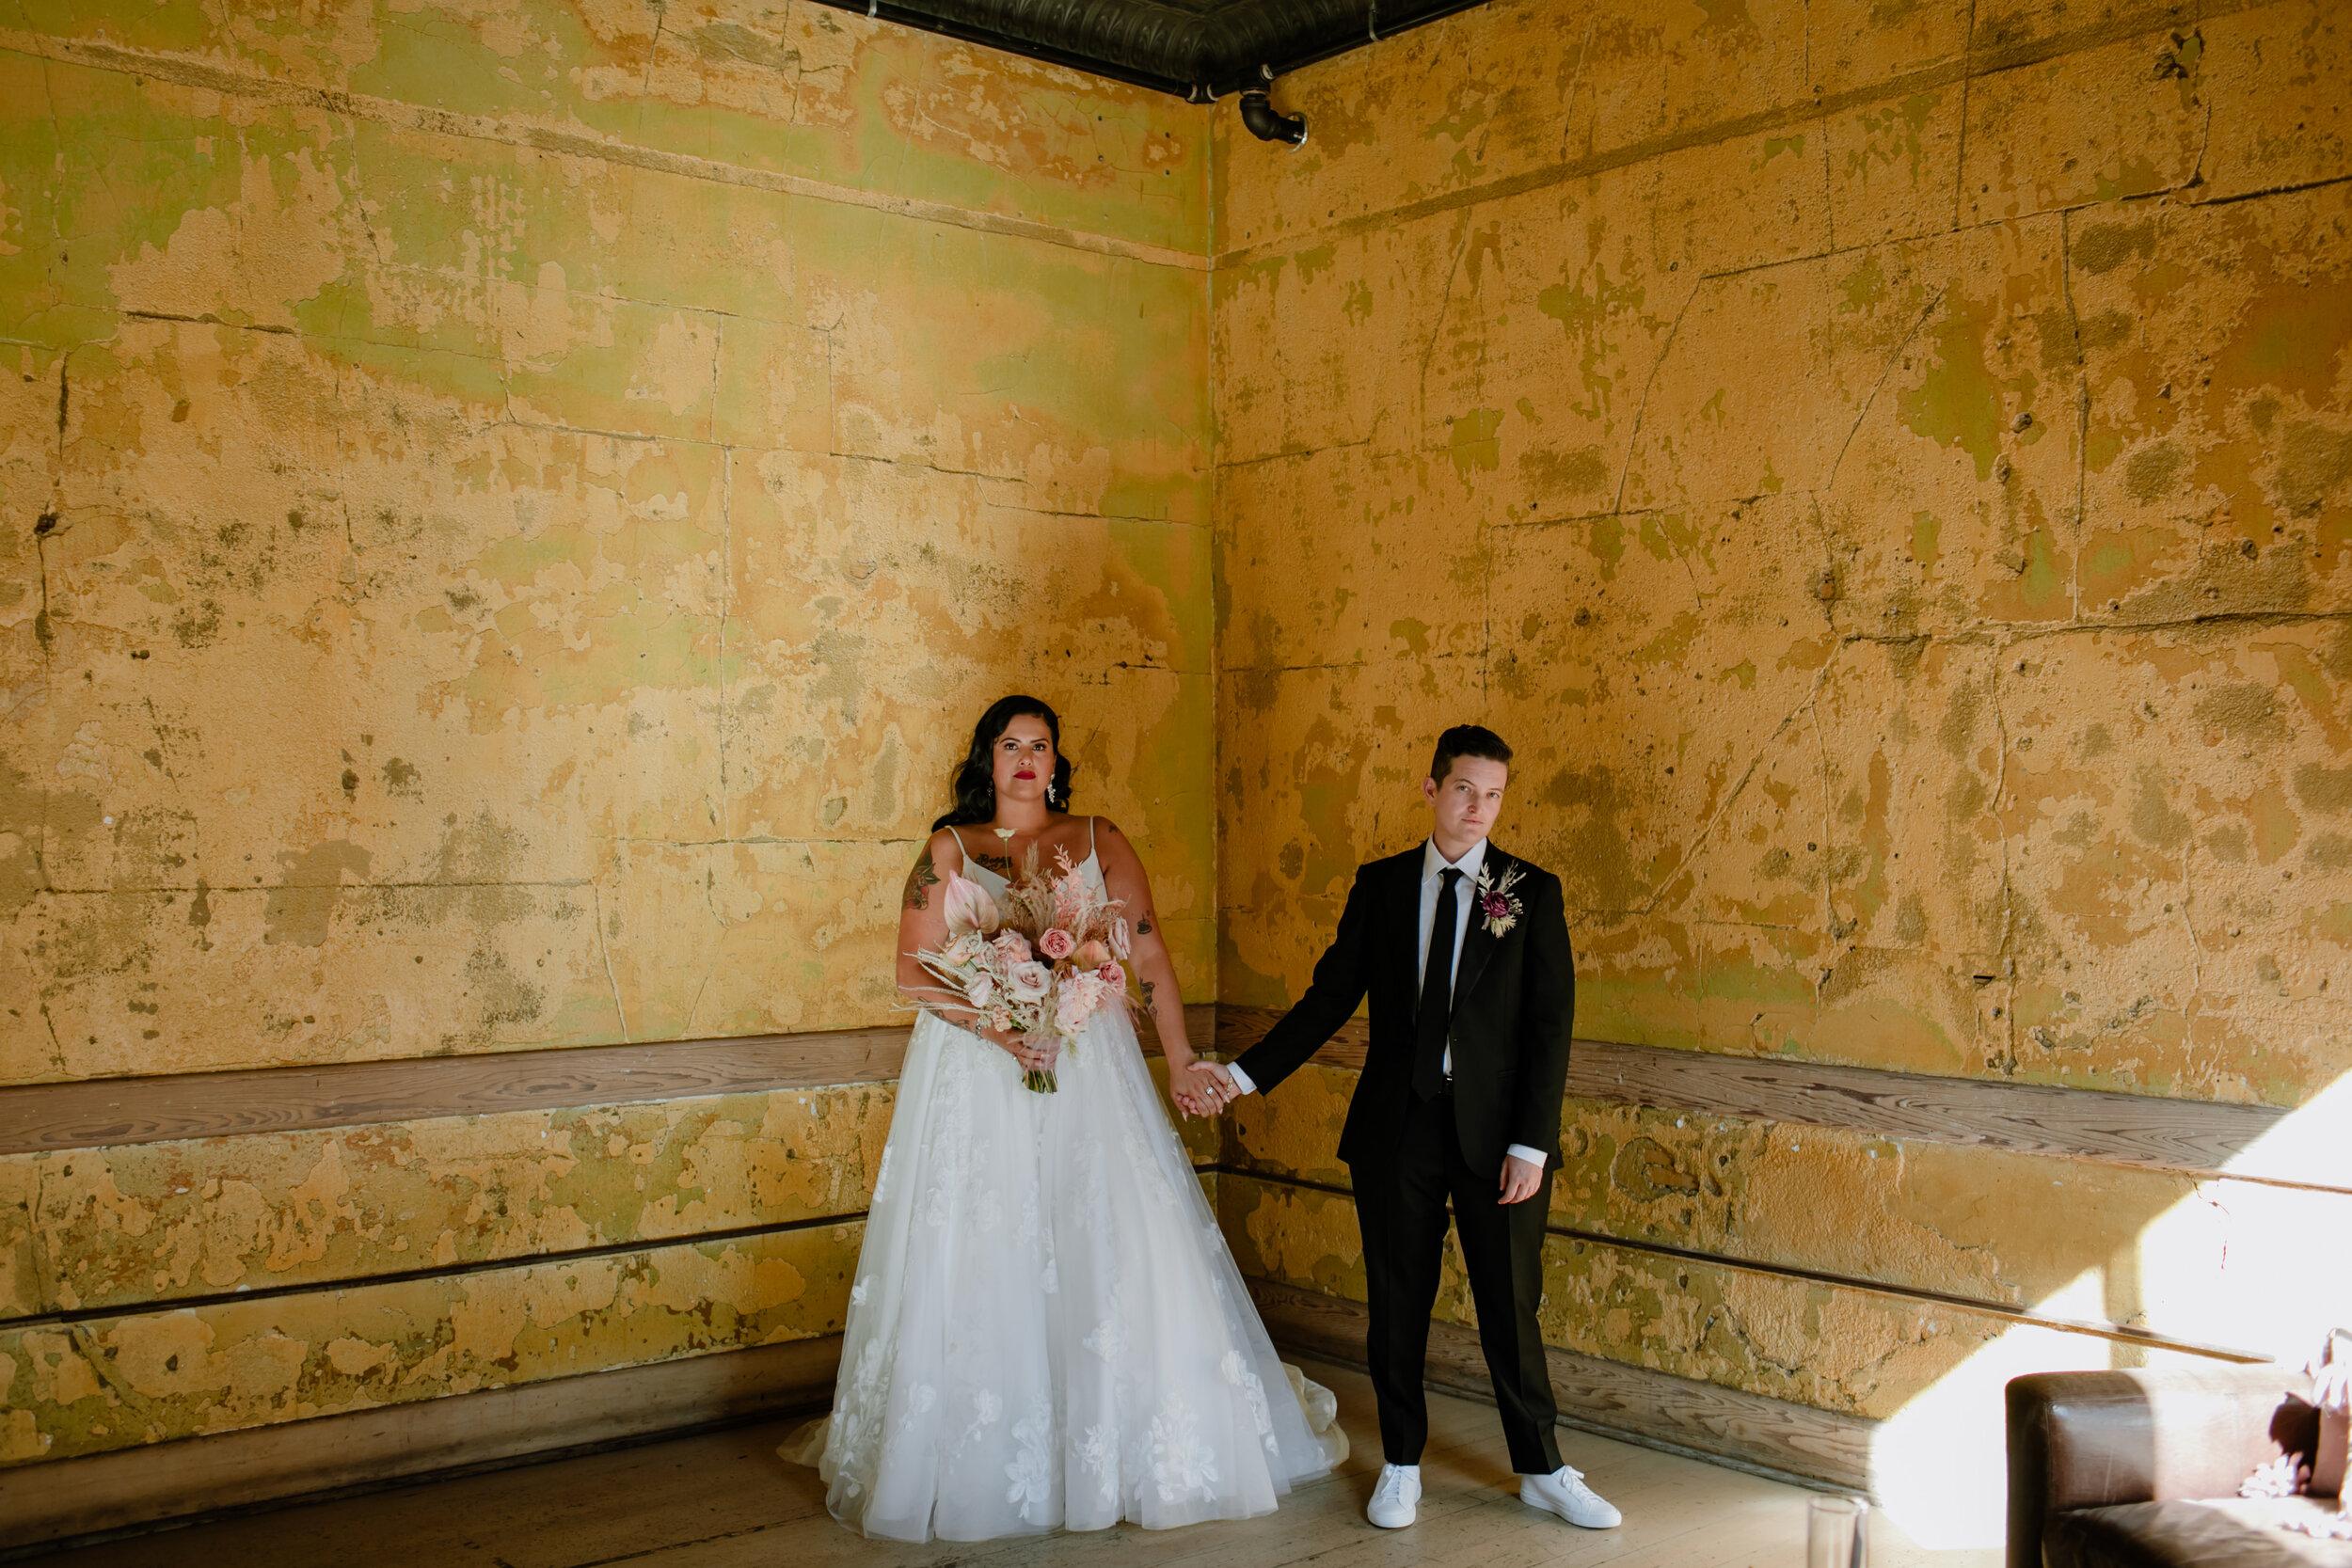 Jenna and Jay Wedding - Eve Rox Photography-2.jpg